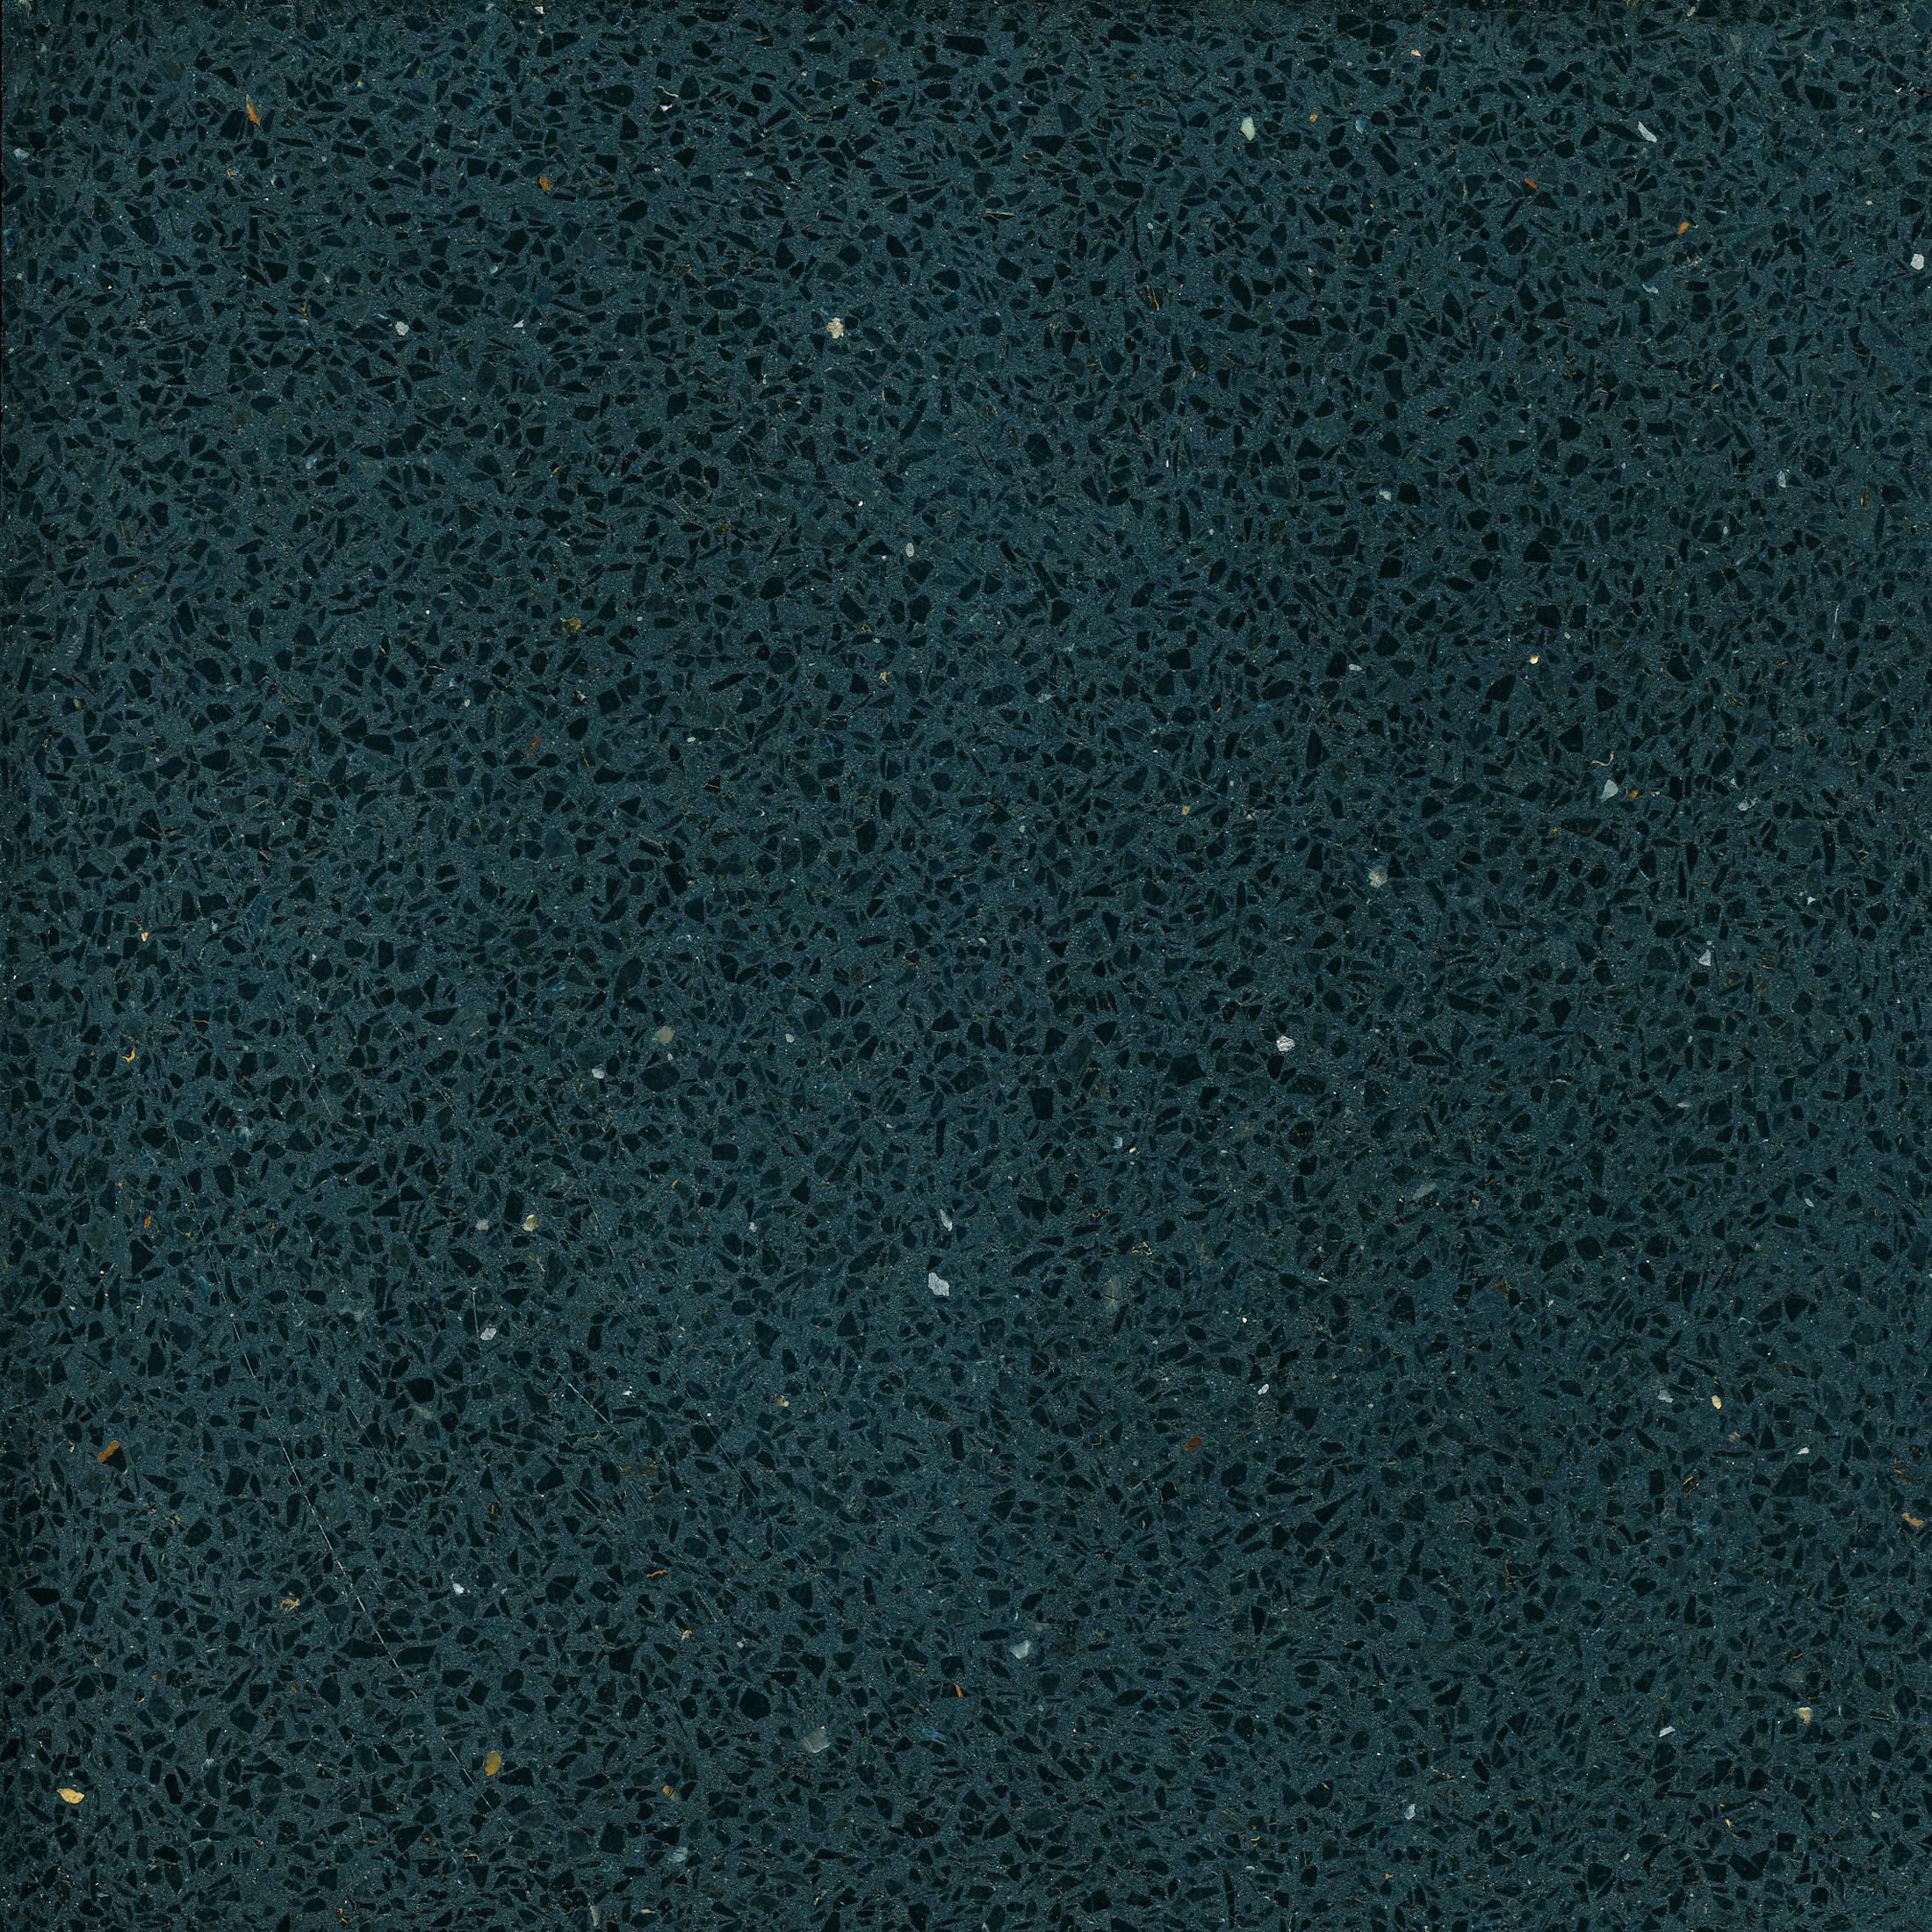 Black Terrazzo Flooring